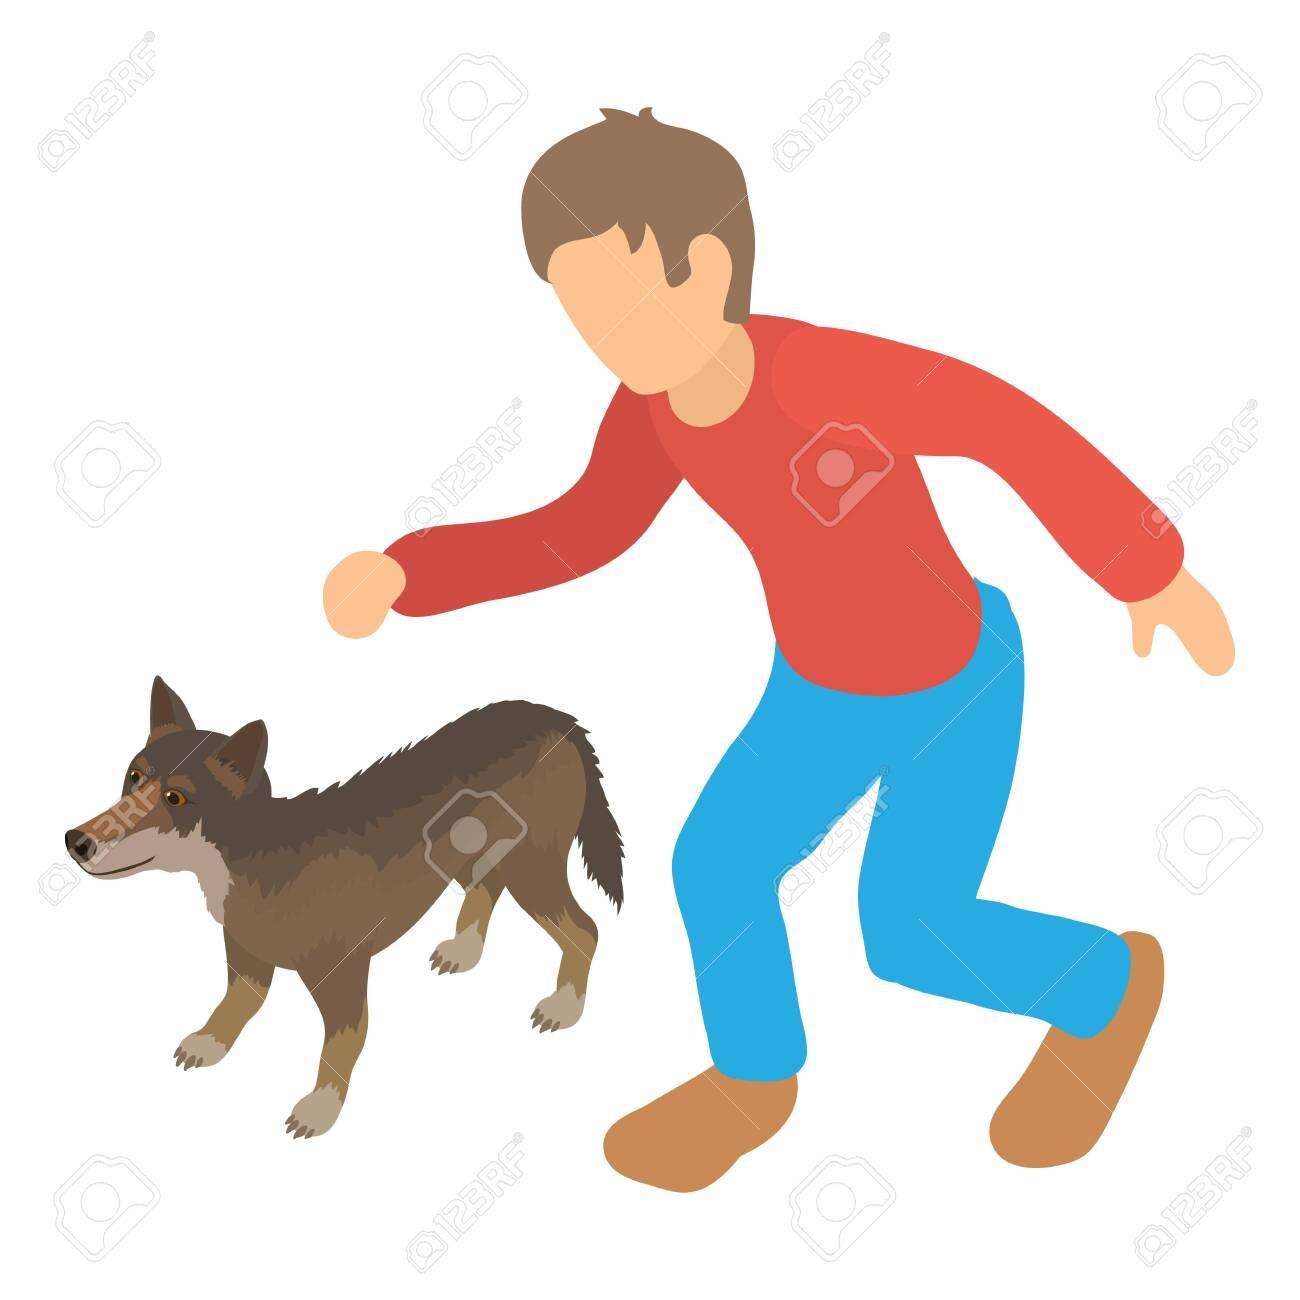 Animal protection icon, isometric style - 137092231